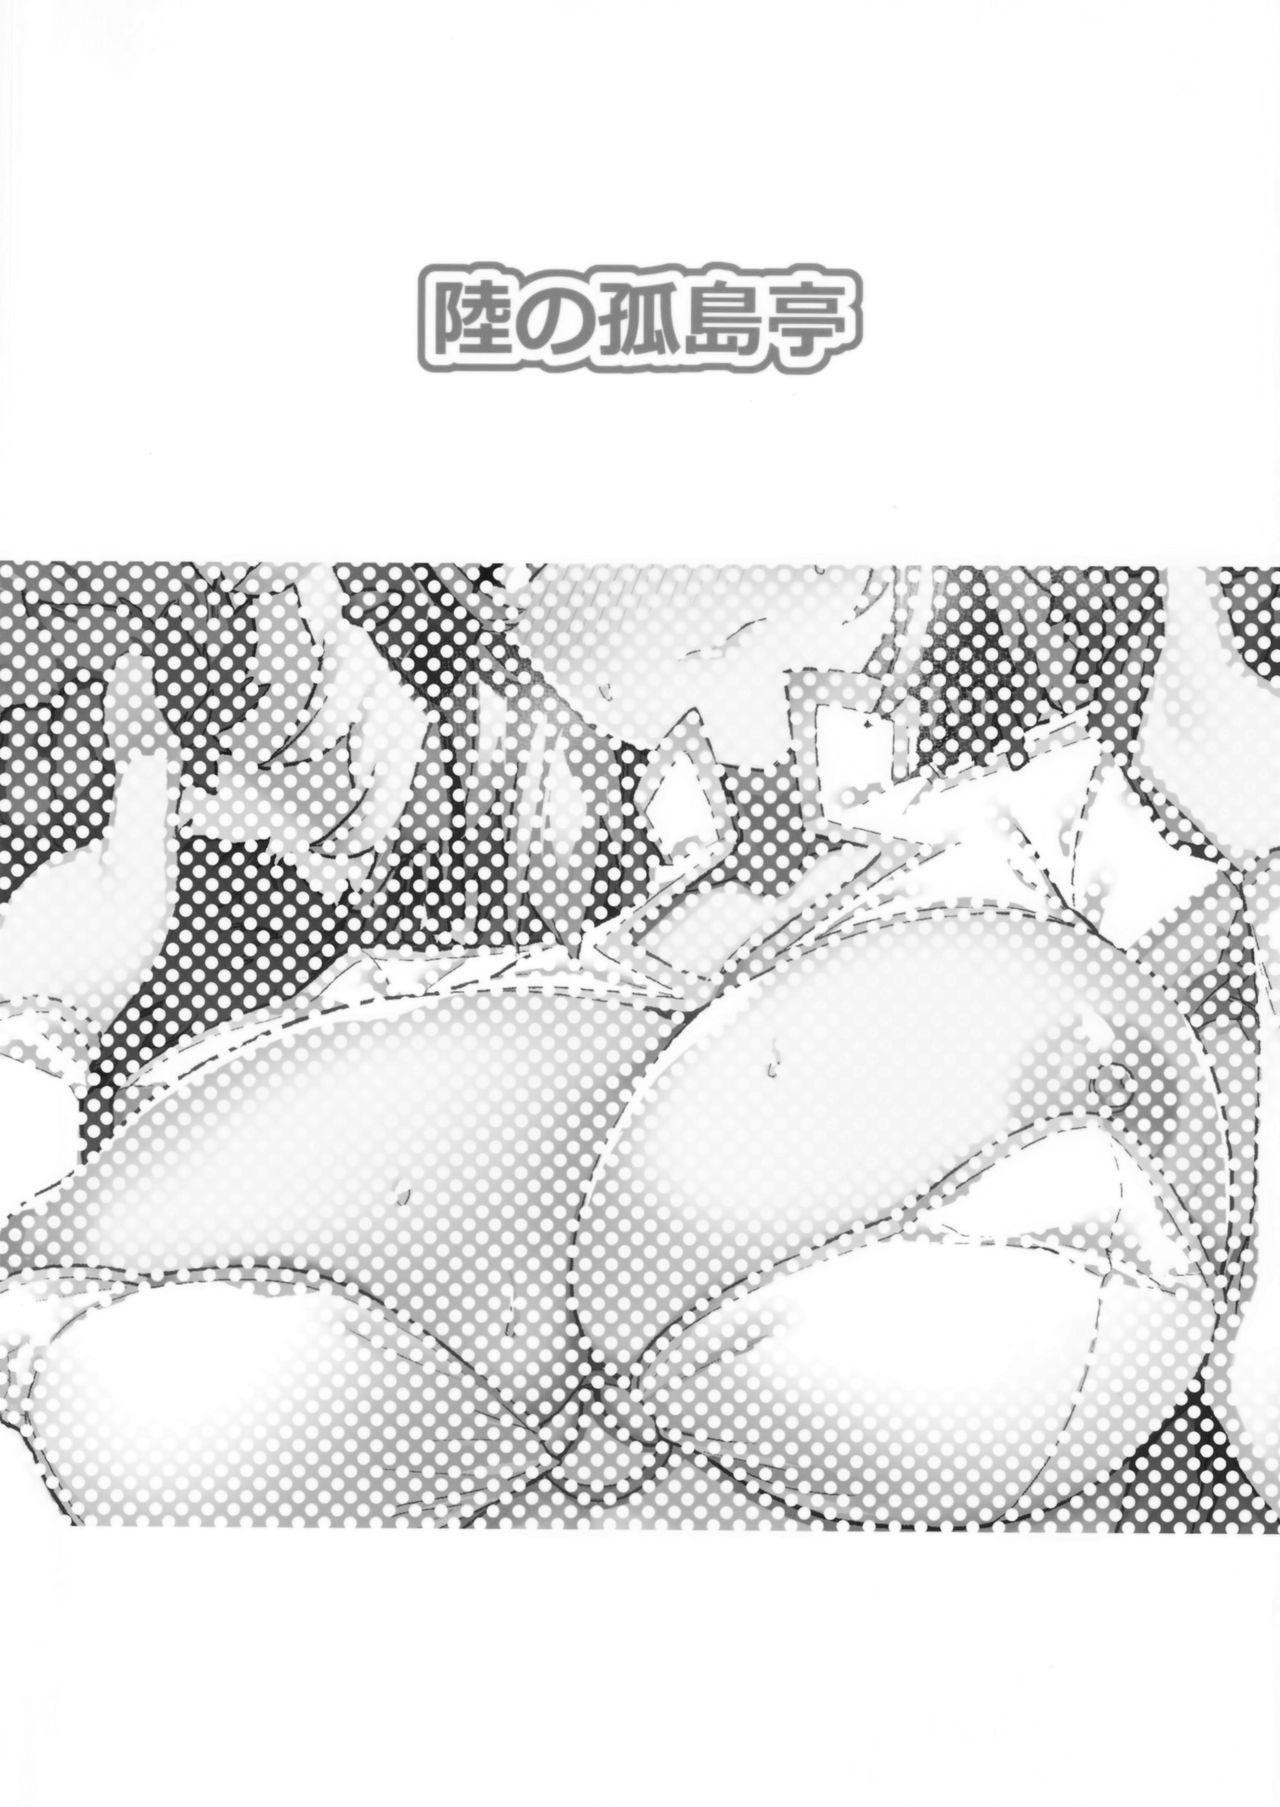 Suki Nandesho? Master wa, Kouiu no ga... | You Like This, Don't You, Master? This Sort Of Thing, I Mean... 27